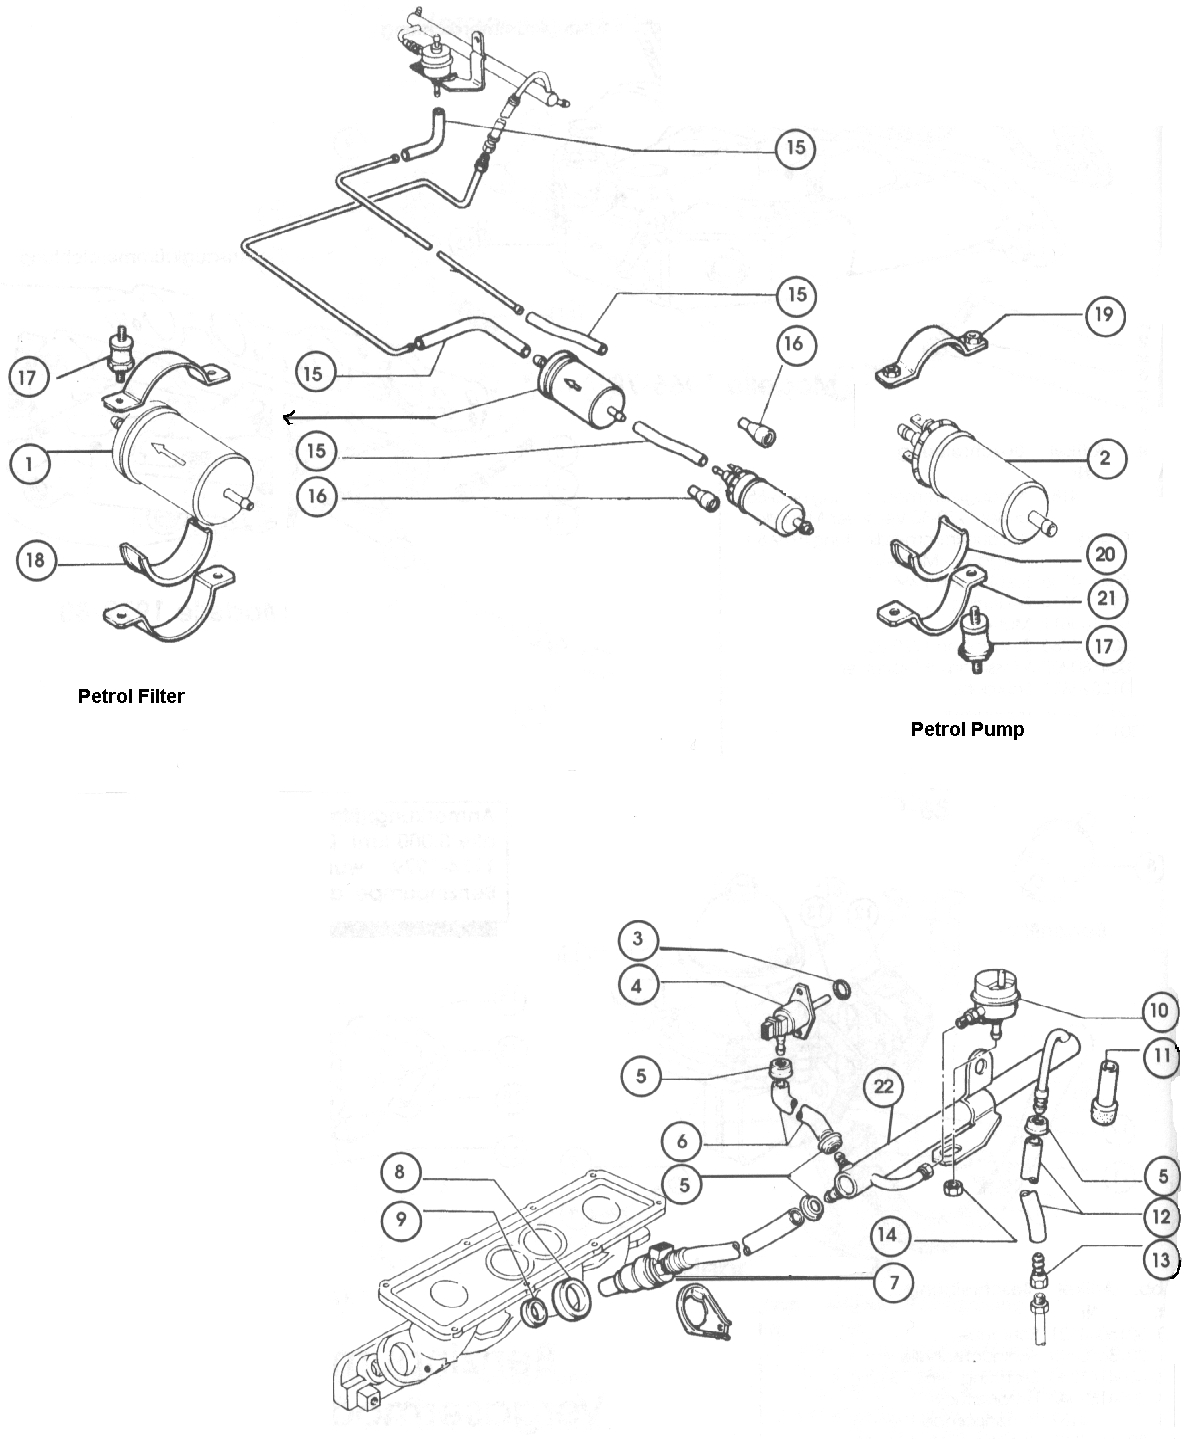 tl_0922] fiat fuel pressure diagram schematic wiring  coun penghe ilari gresi chro carn ospor garna grebs unho rele  mohammedshrine librar wiring 101